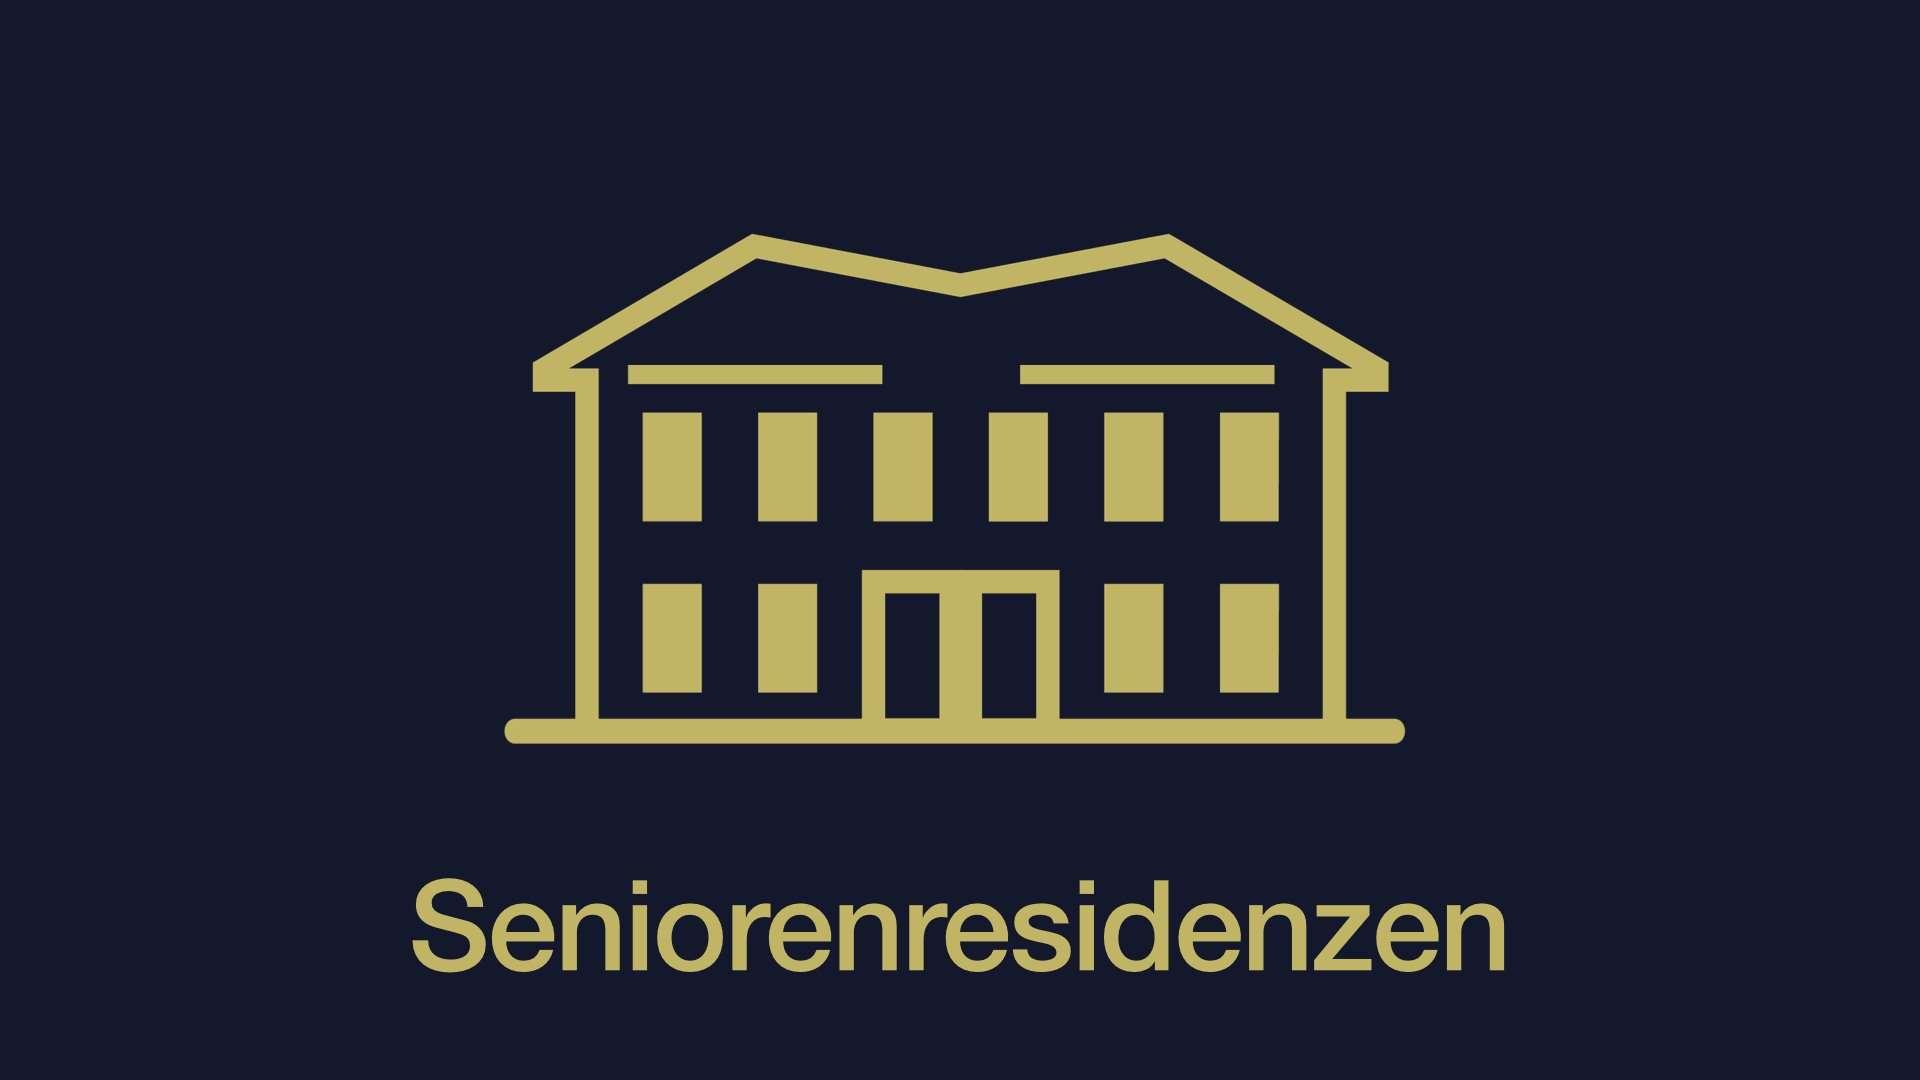 Seniorenresidenzen